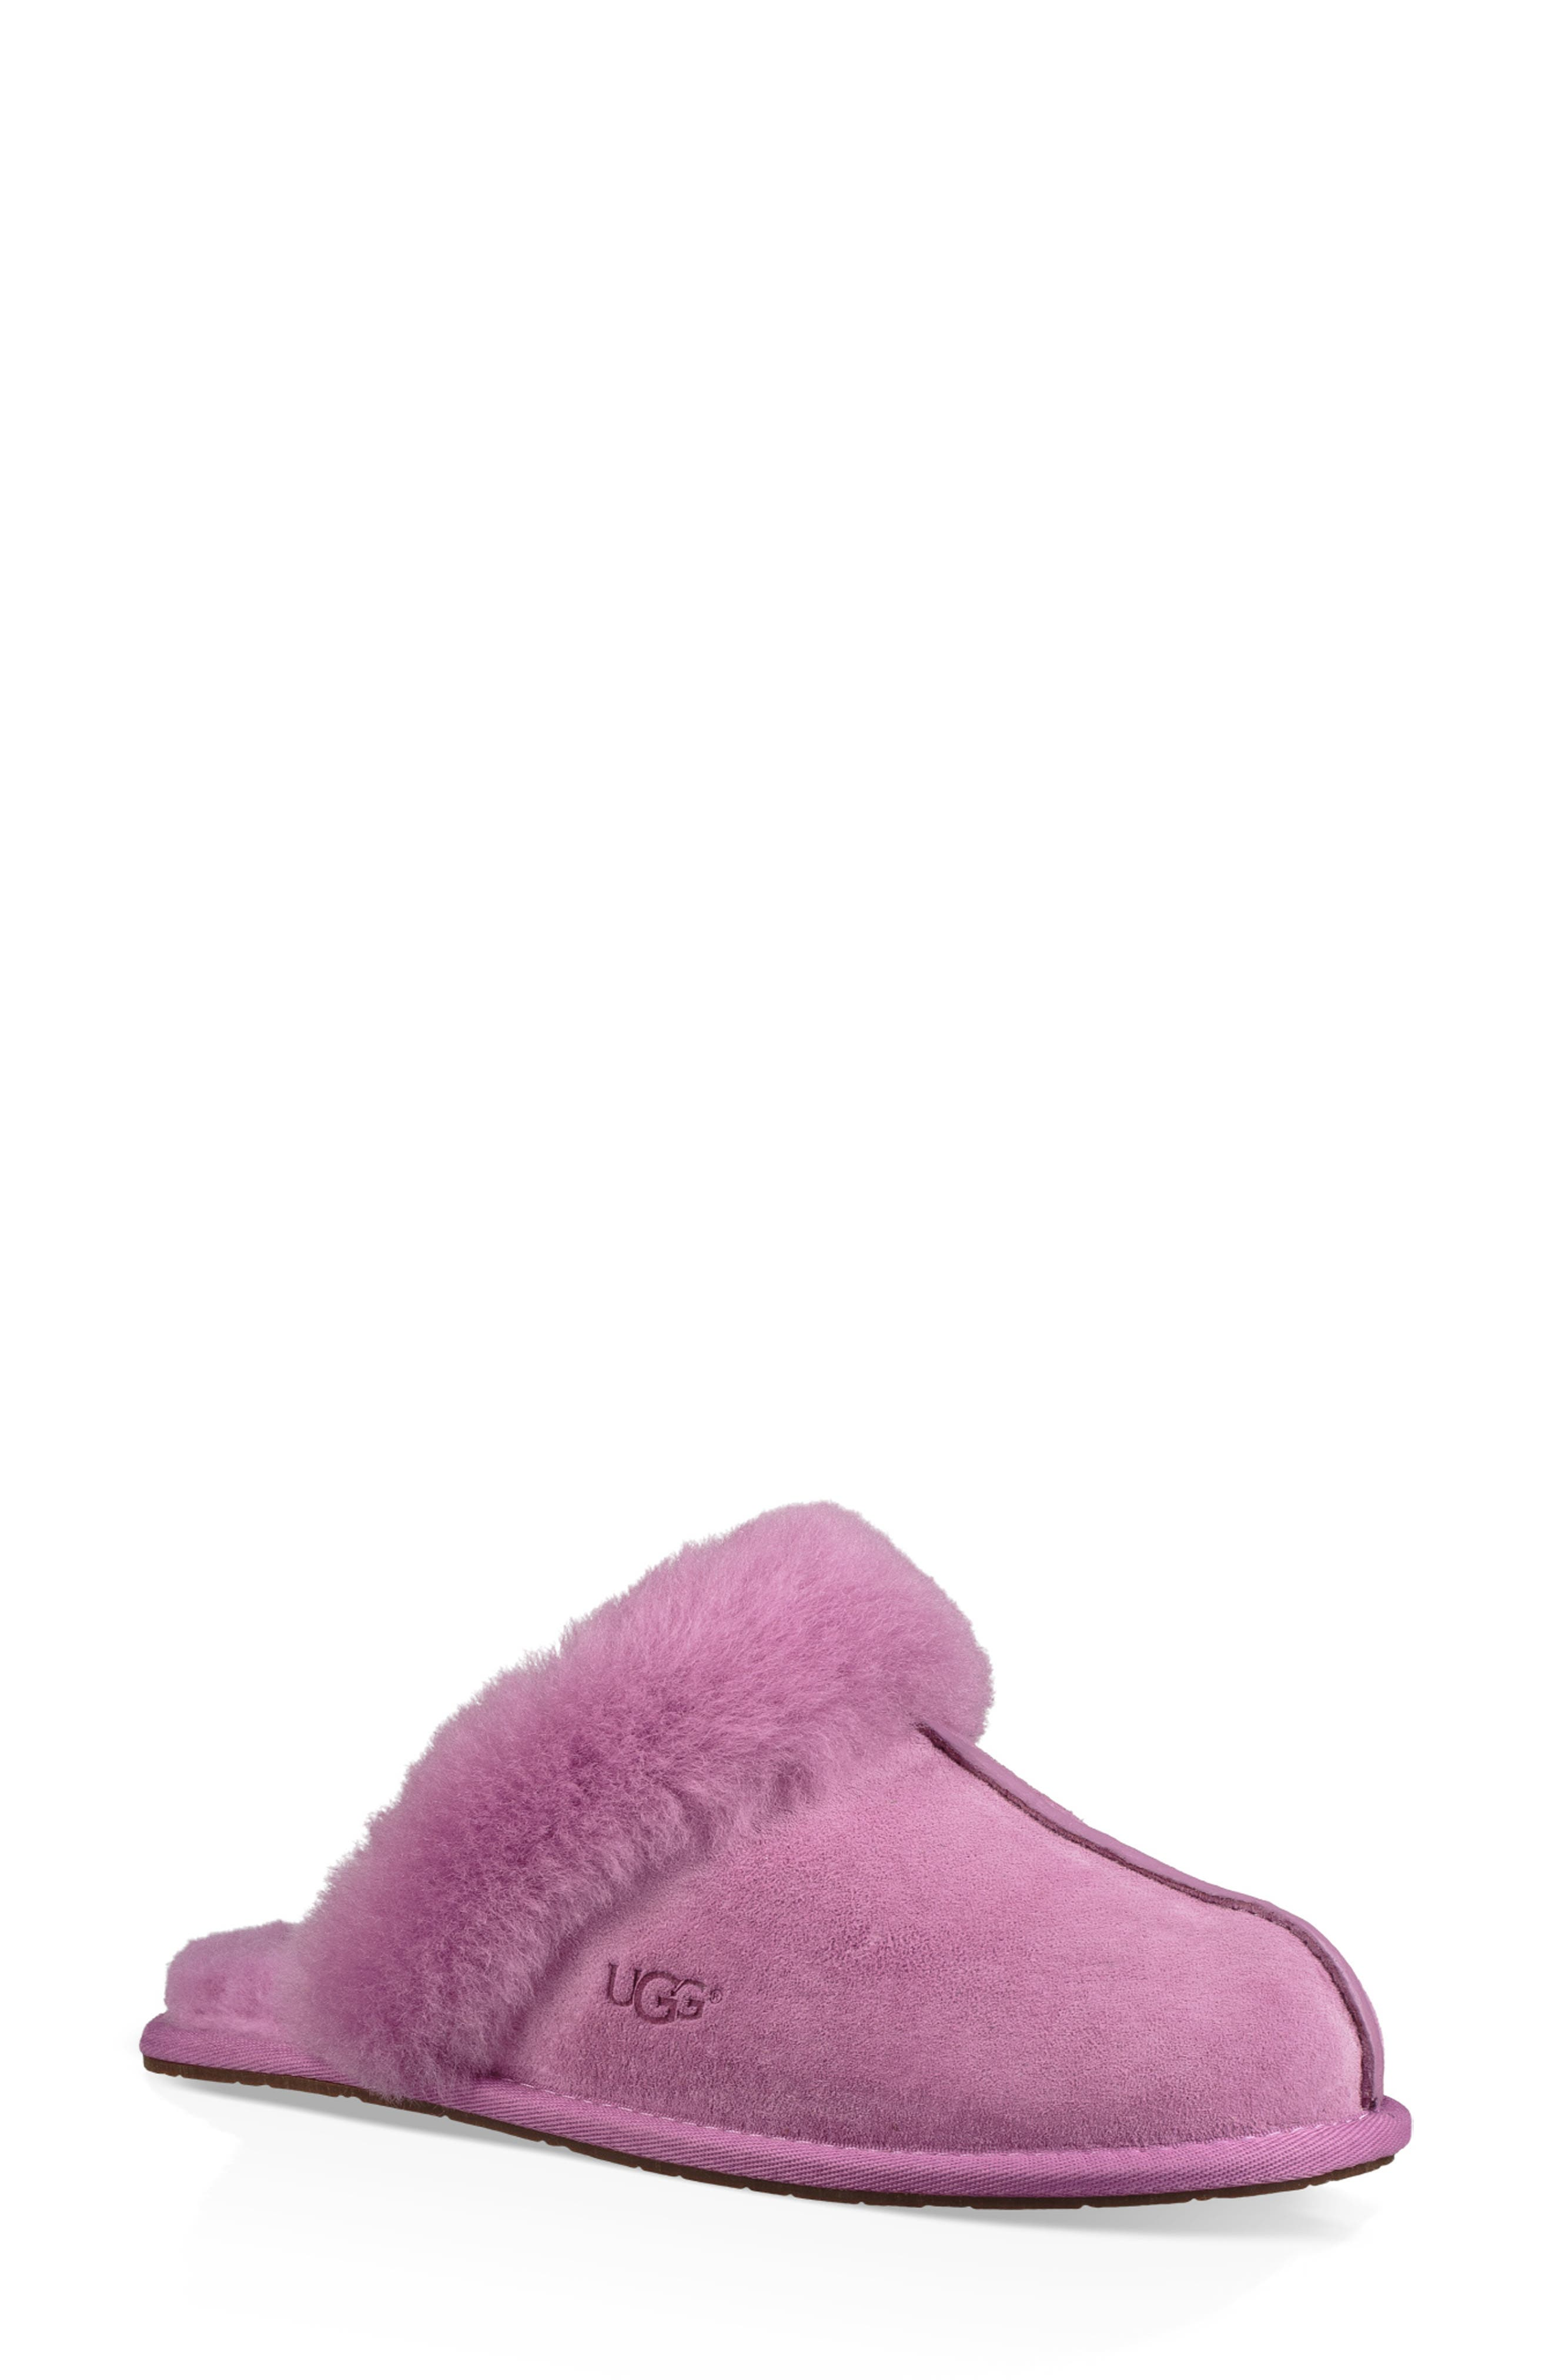 Scuffette II Water Resistant Slipper,                         Main,                         color, BODACIOUS